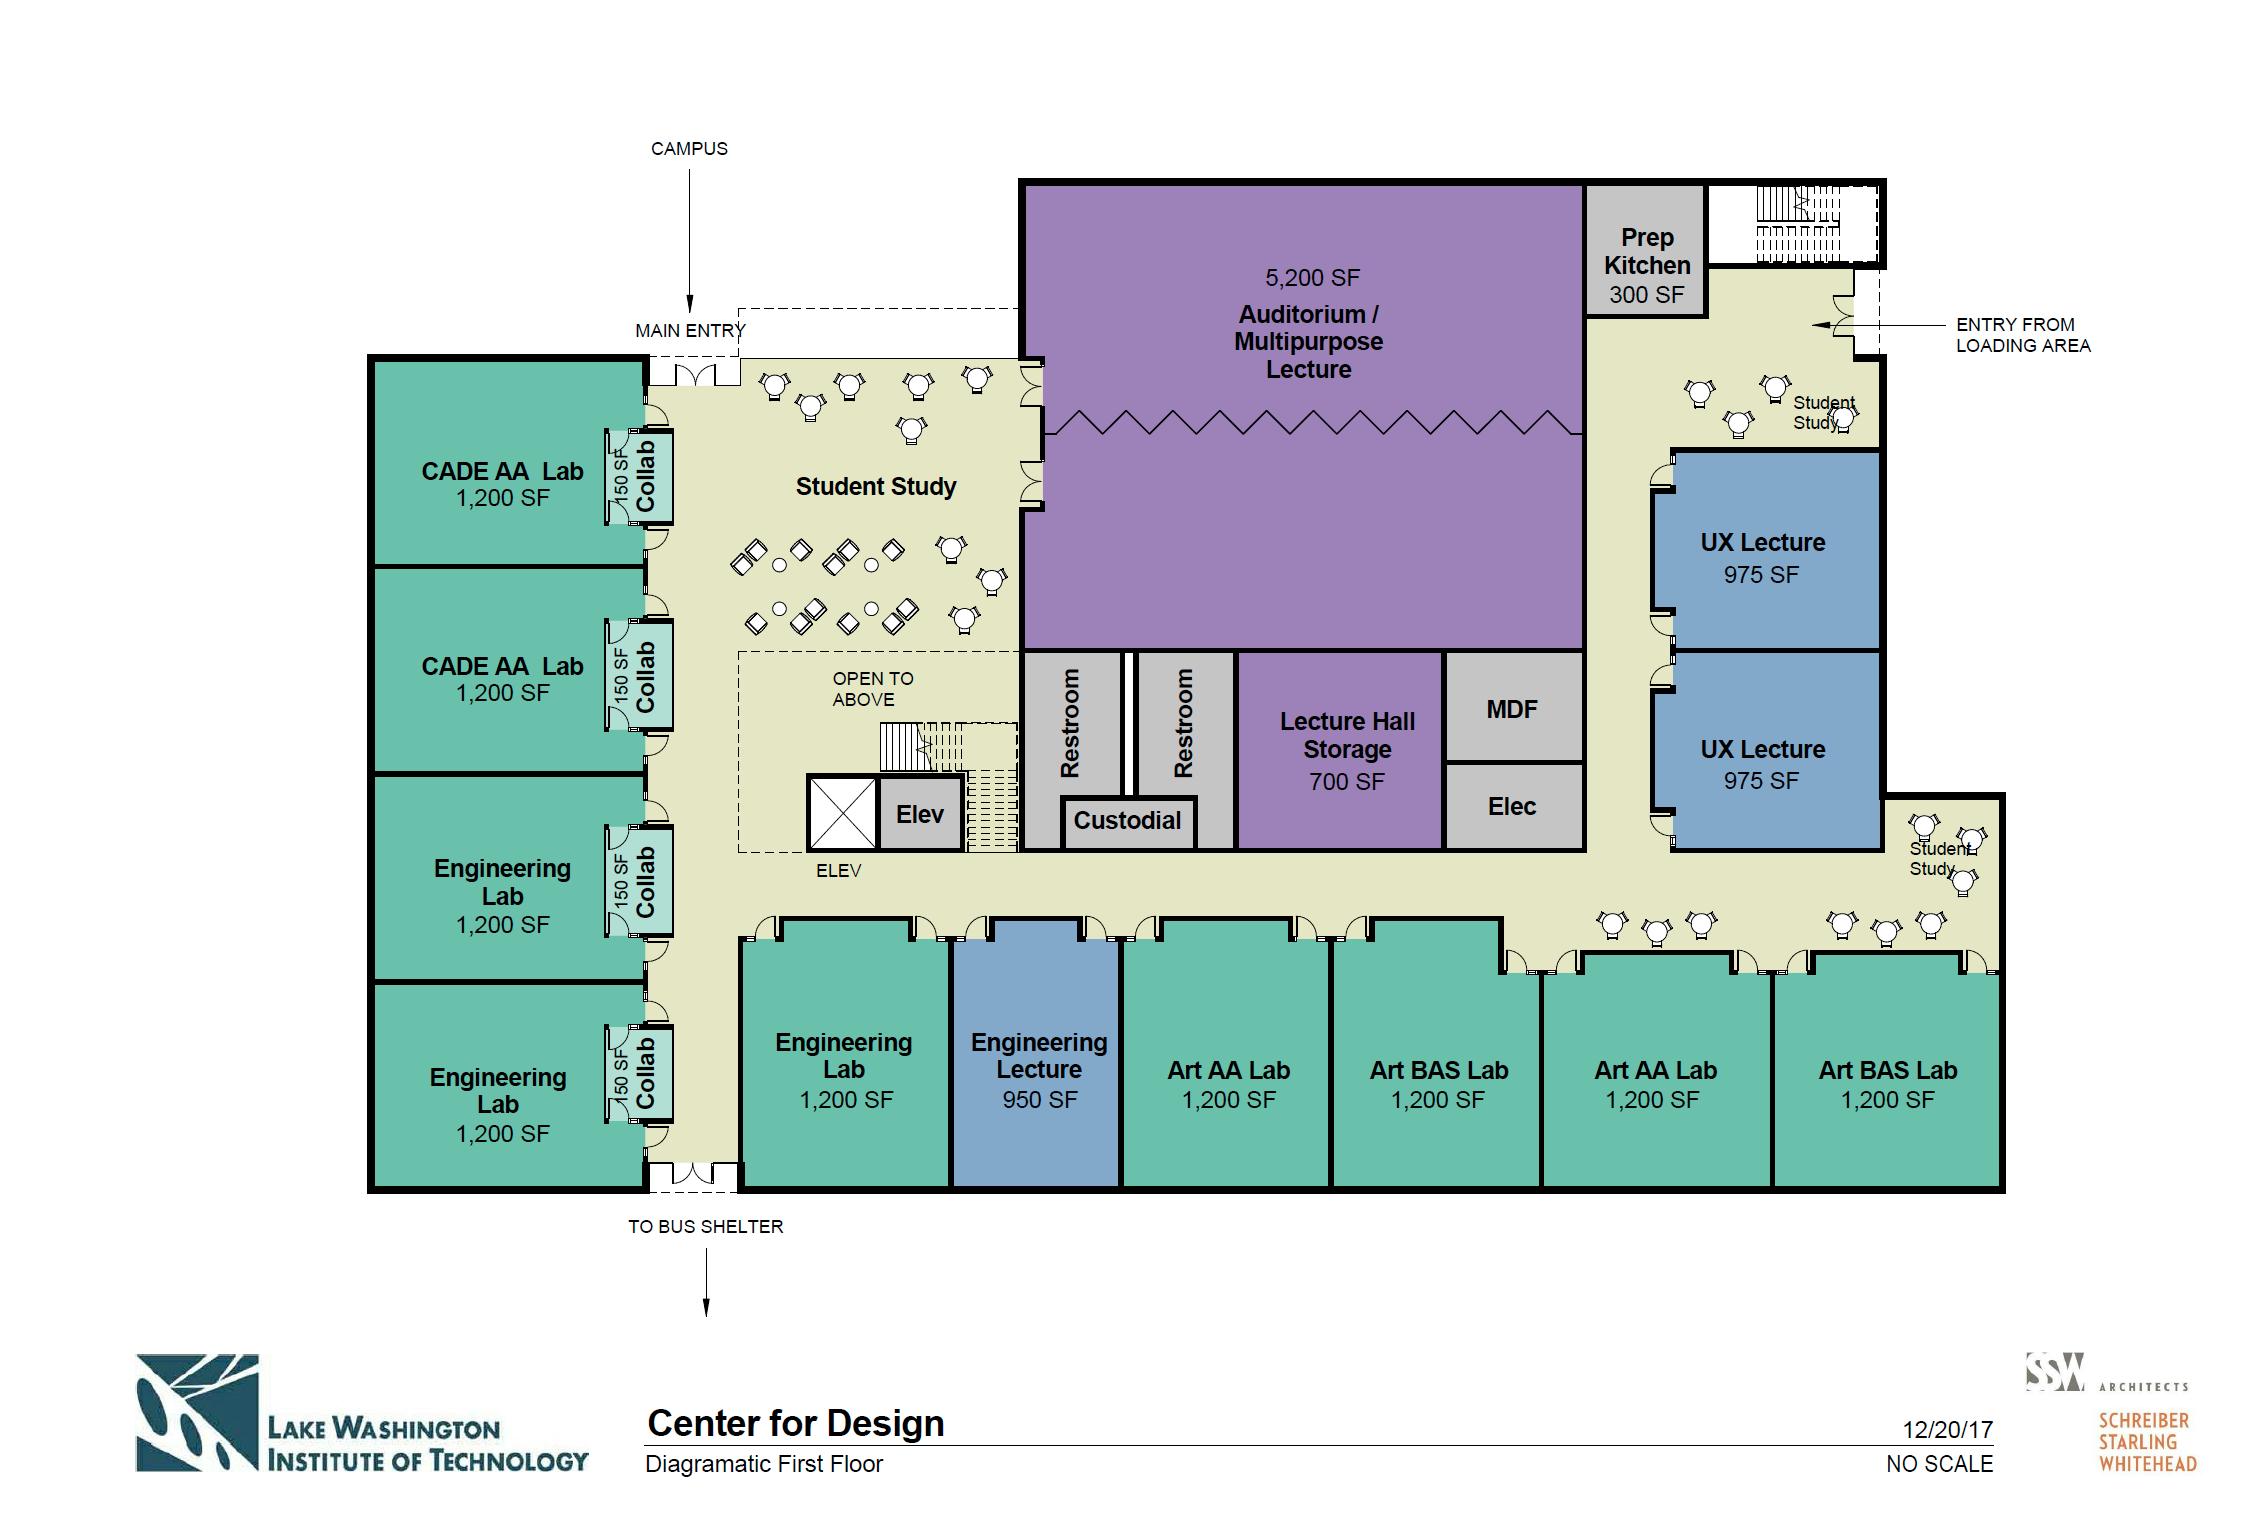 Center for Design First Floor Diagram